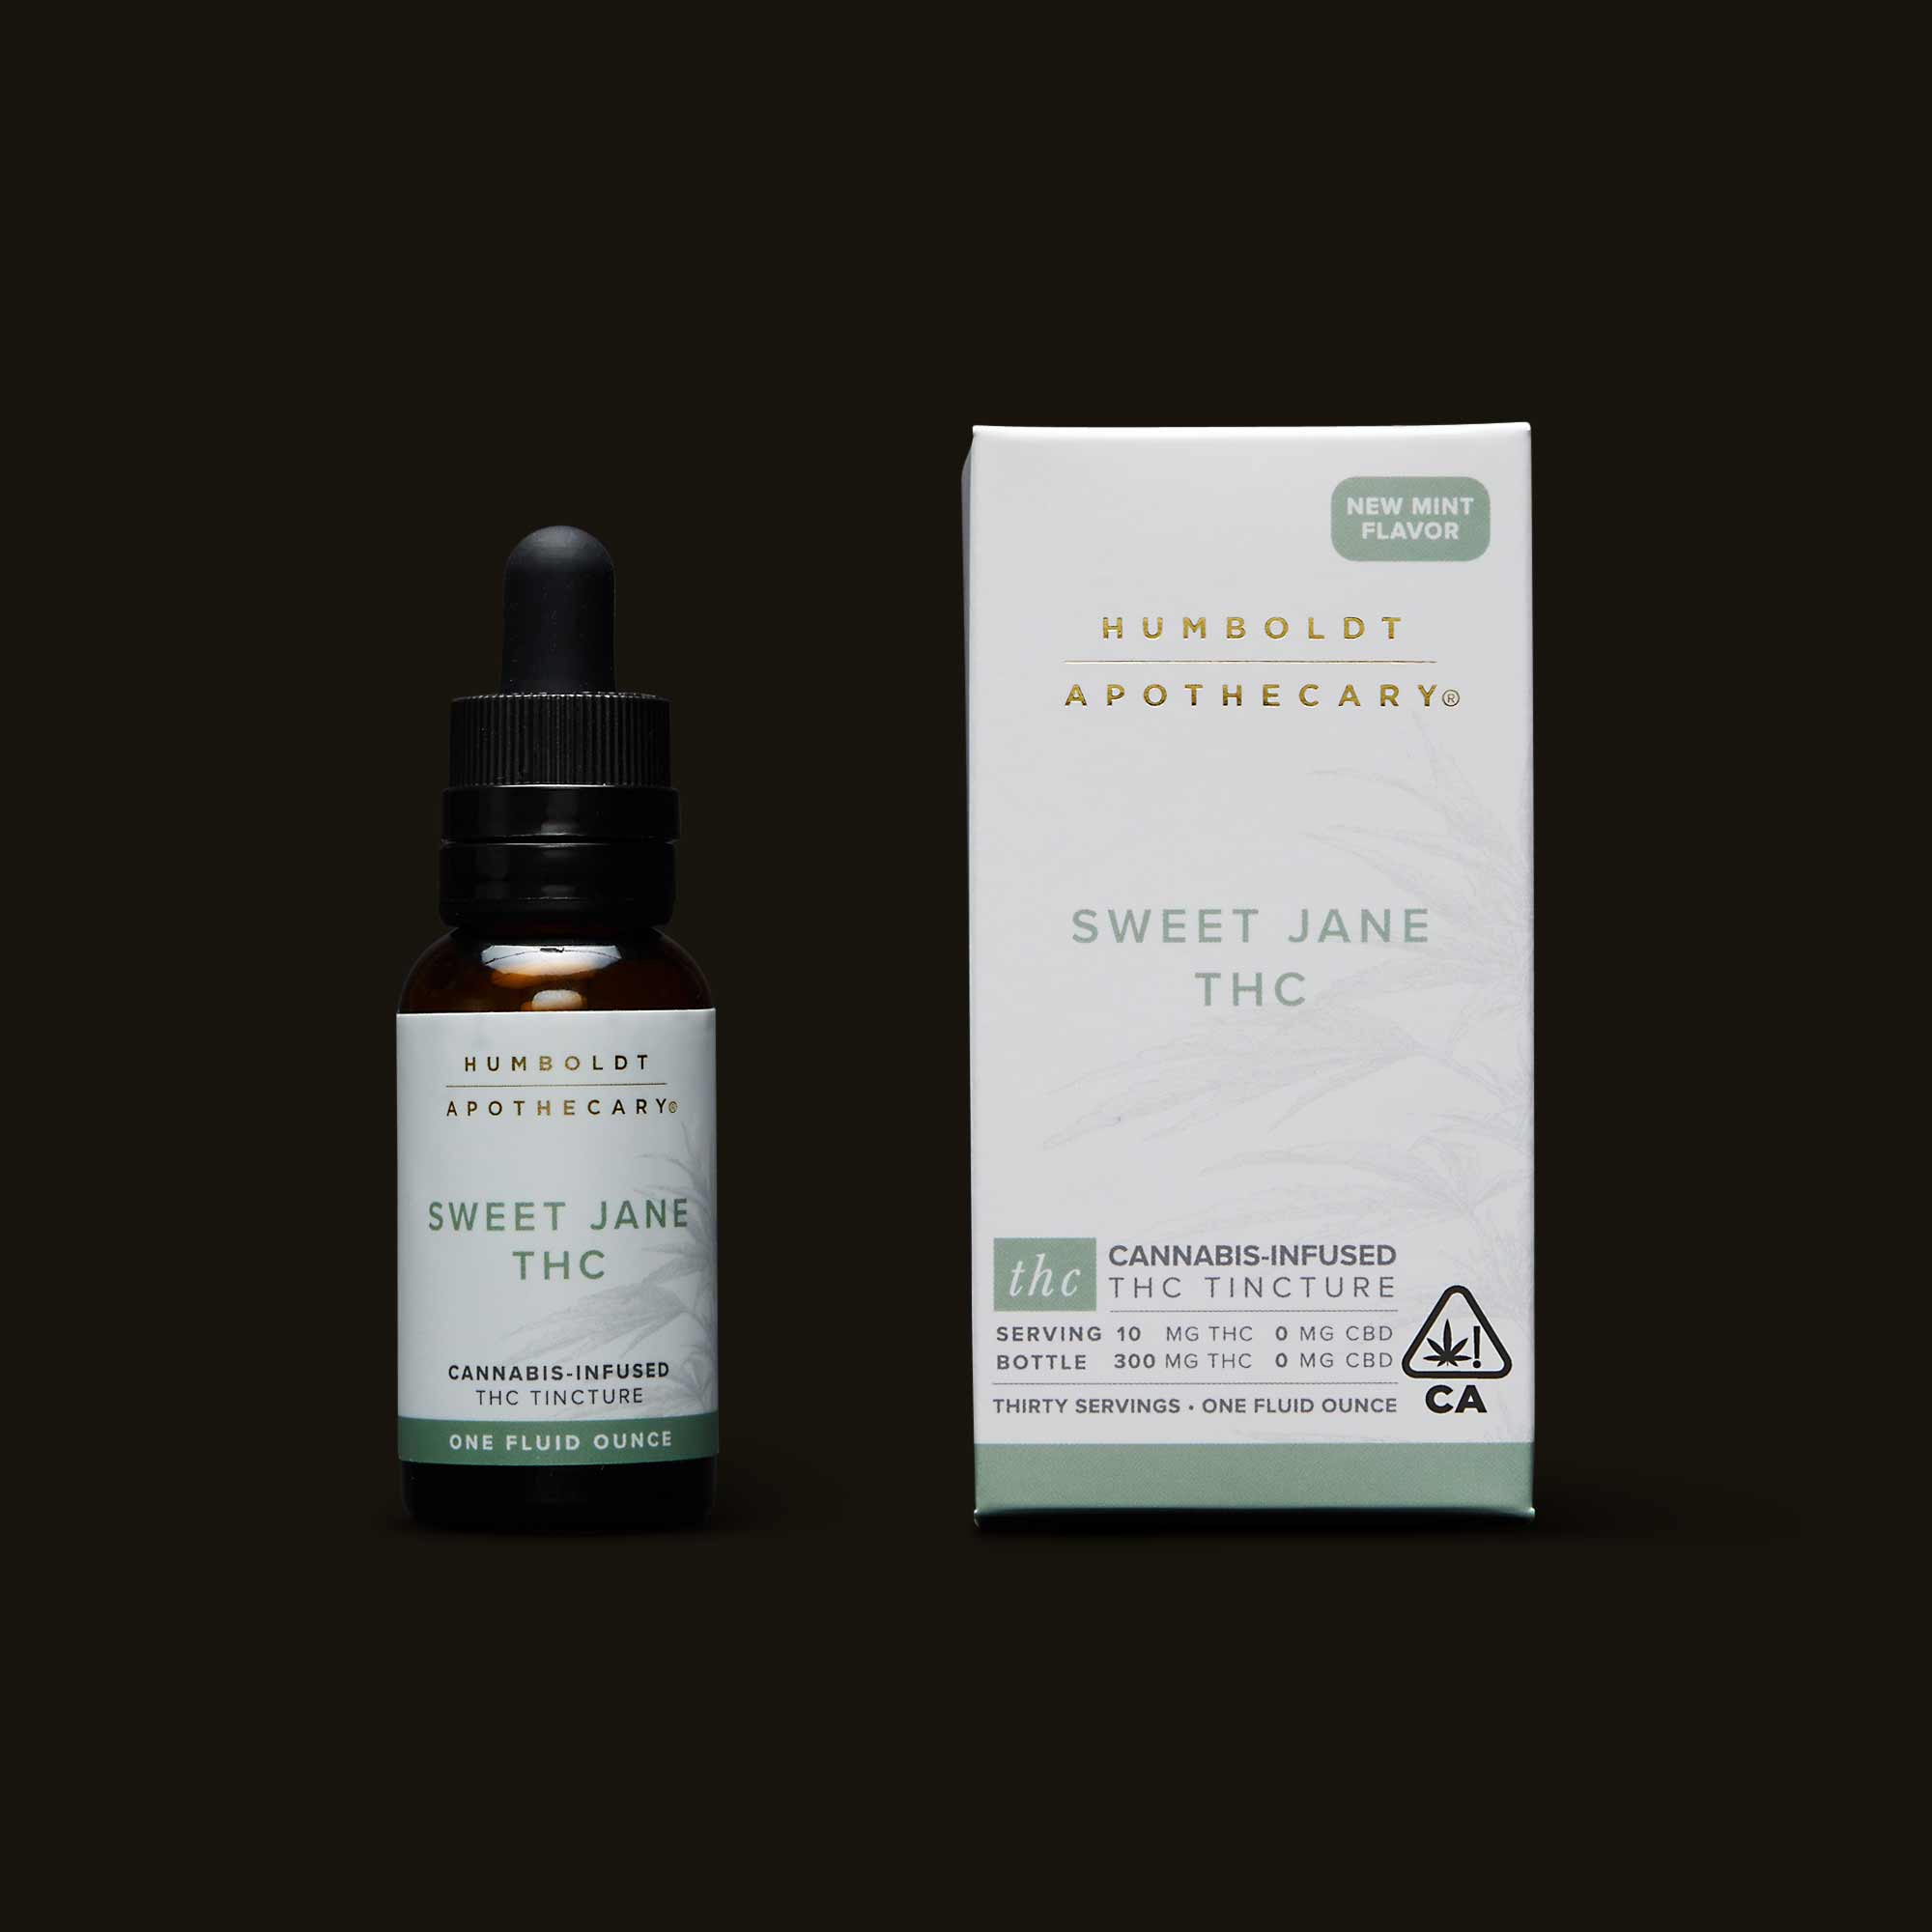 Sweet Jane THC - 1/2fl oz, 1fl oz